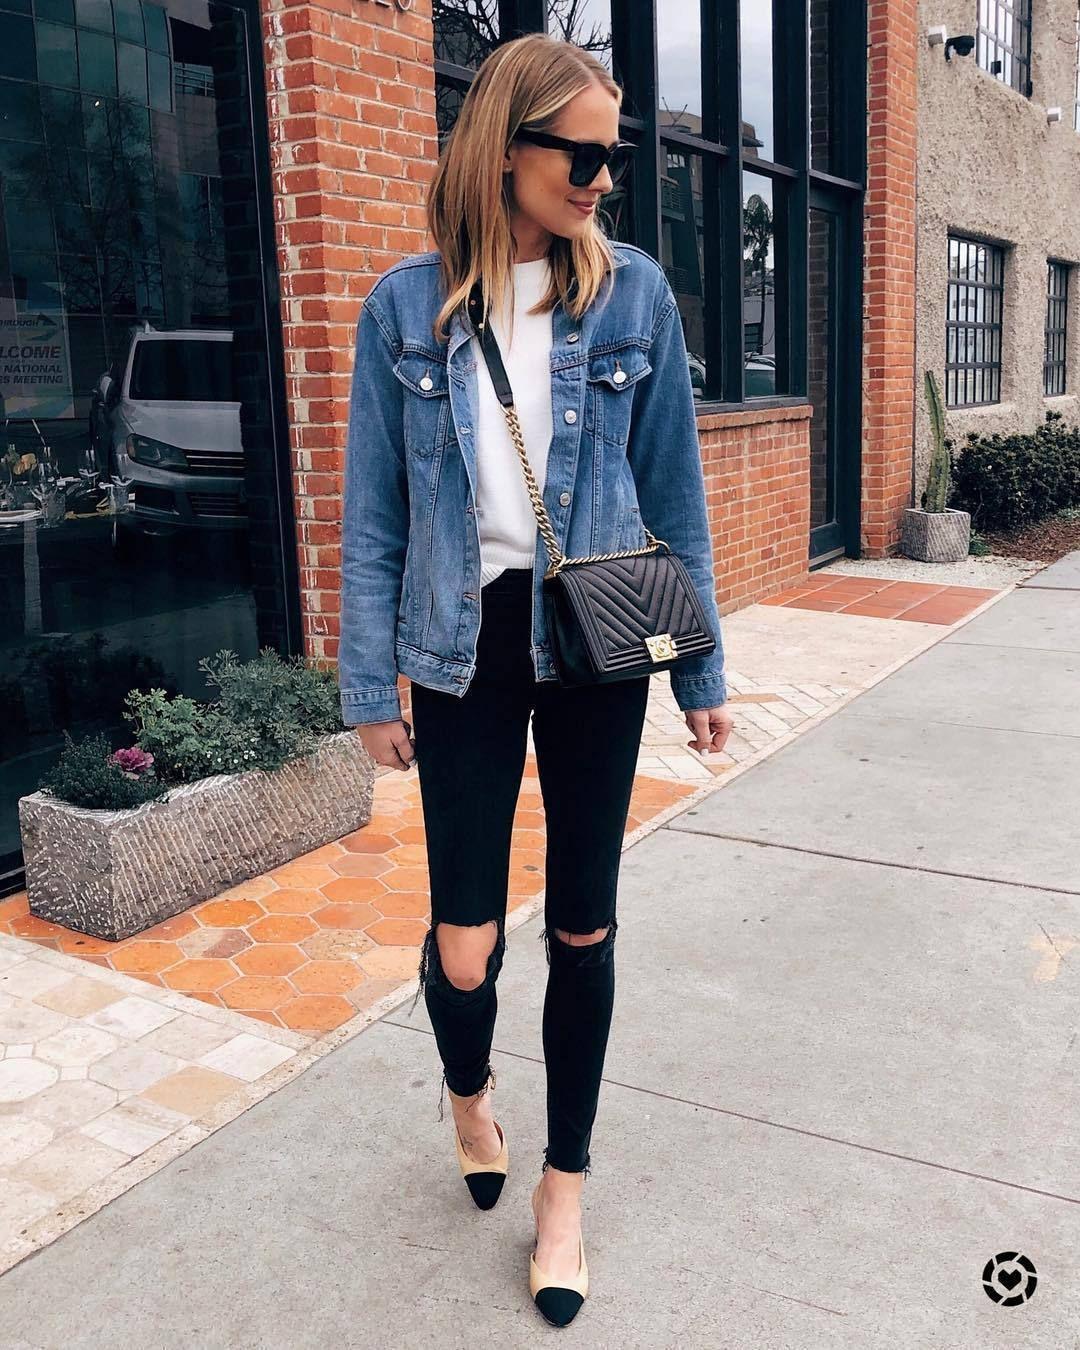 Find Out Where To Get The Jacket Denim Jacket Women Fashion Jackson Oversized Denim Jacket